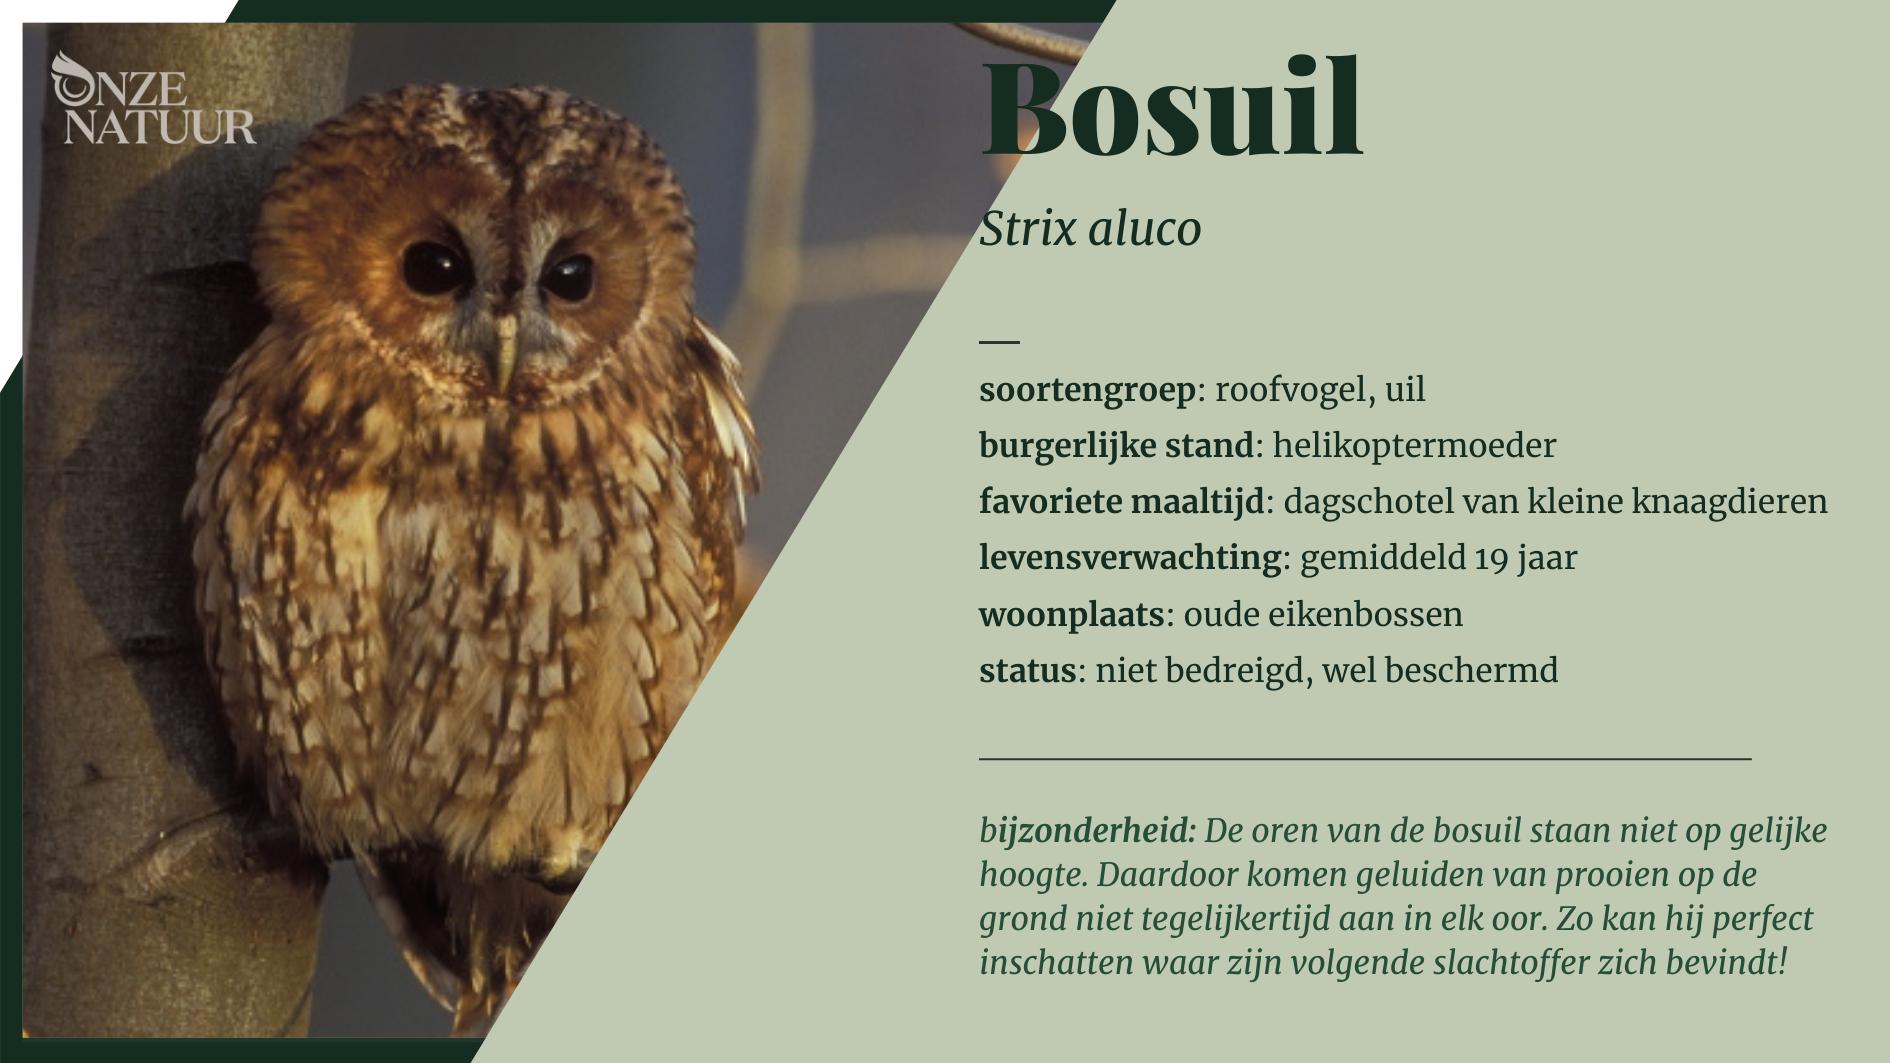 bosuil-soortenfiche.png